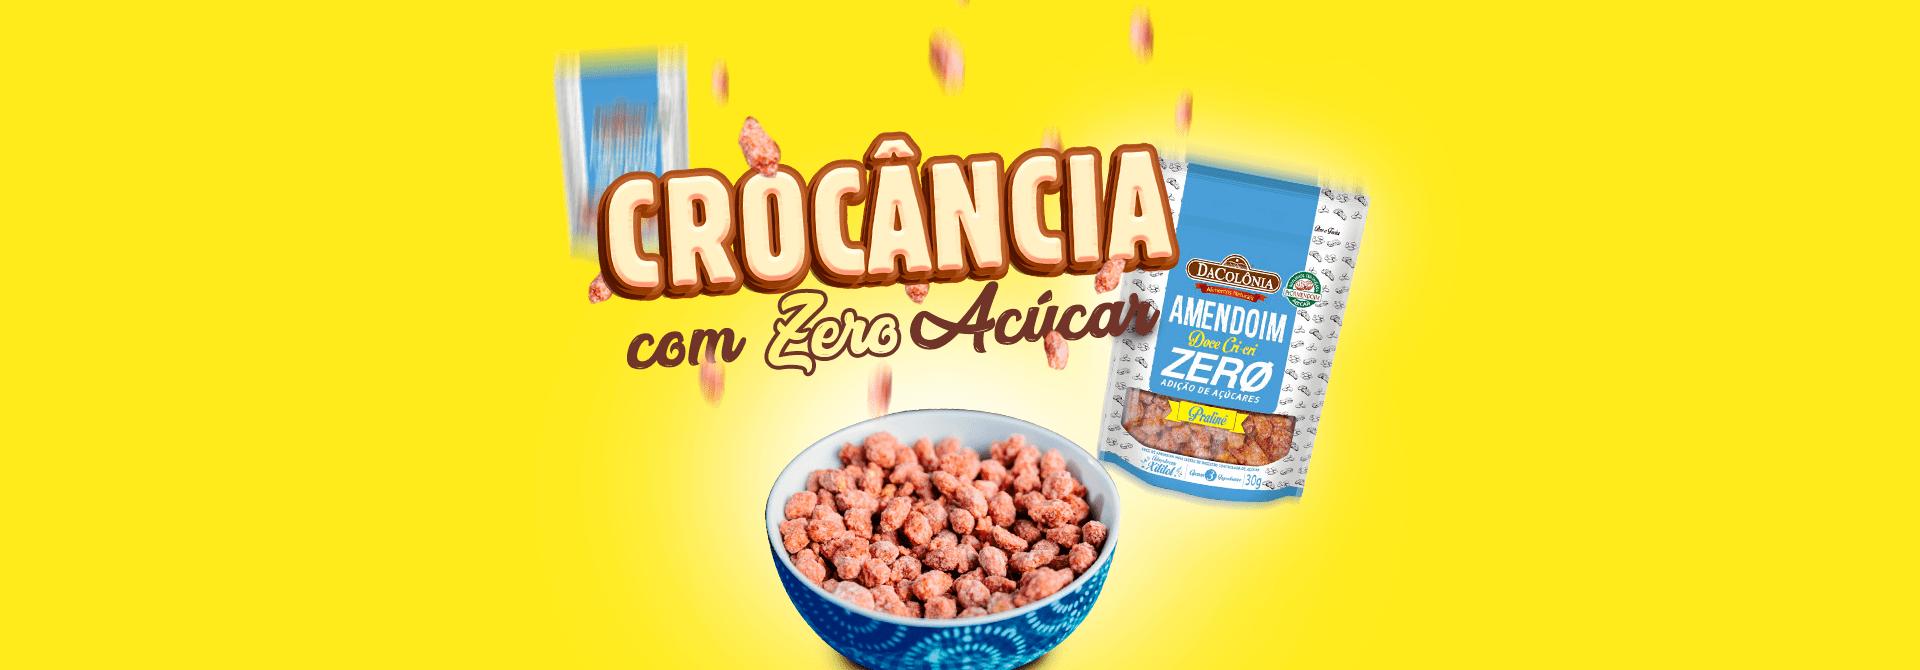 Amendoim Zero